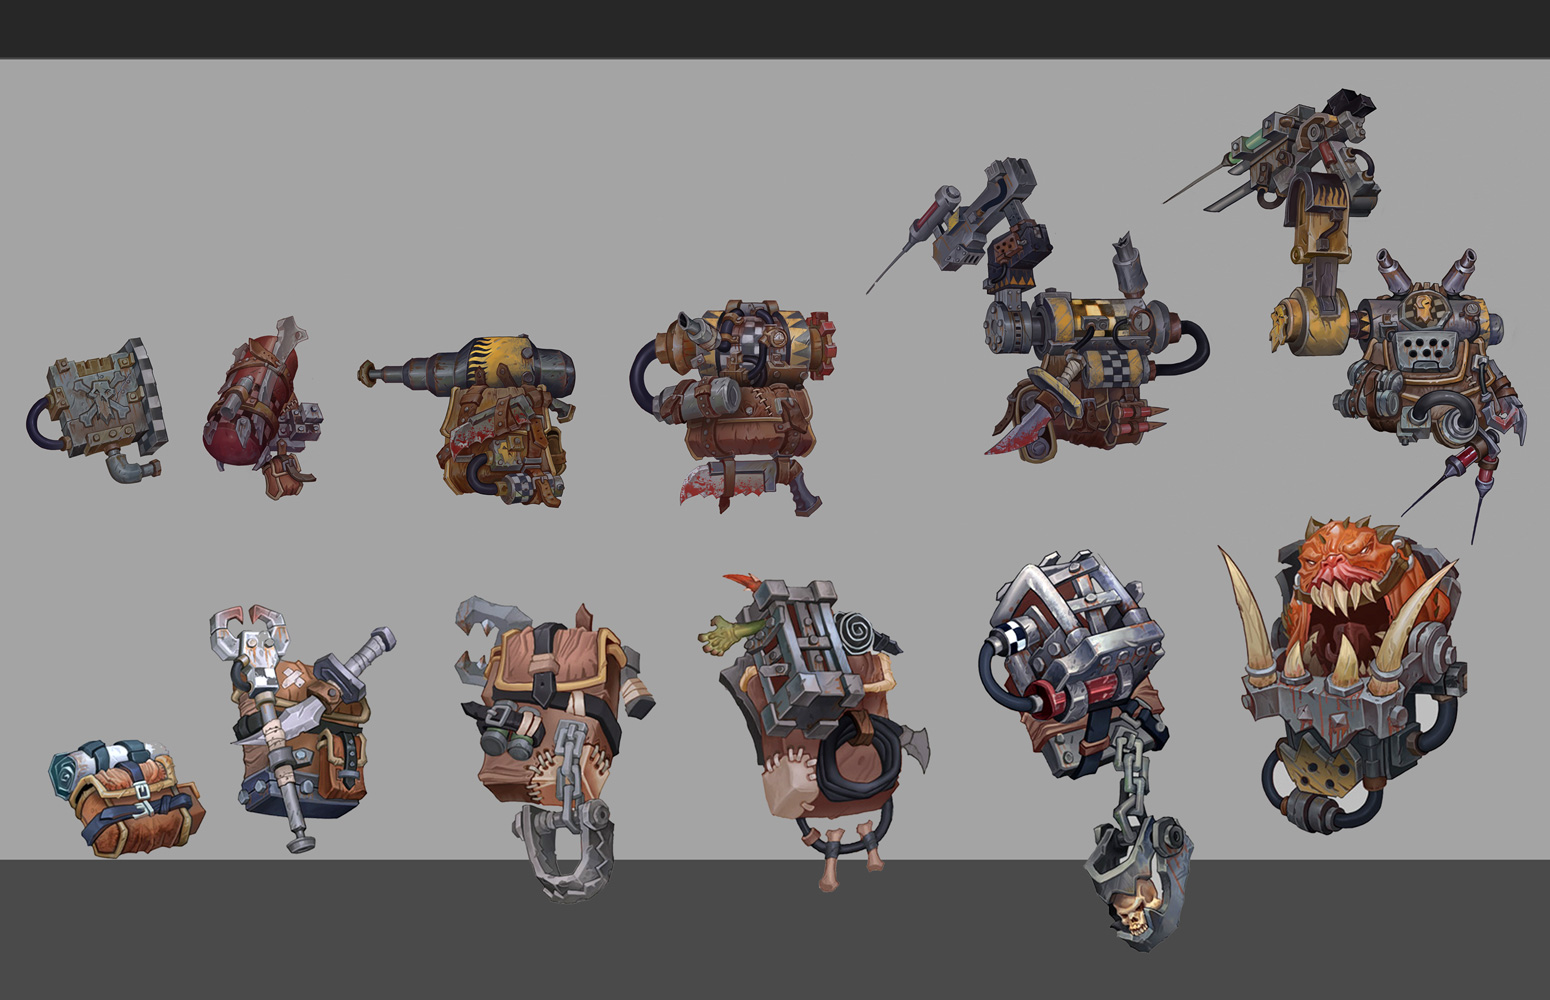 [E3] Eternal Crusade, un MMO Warhammer 40K - Page 3 14